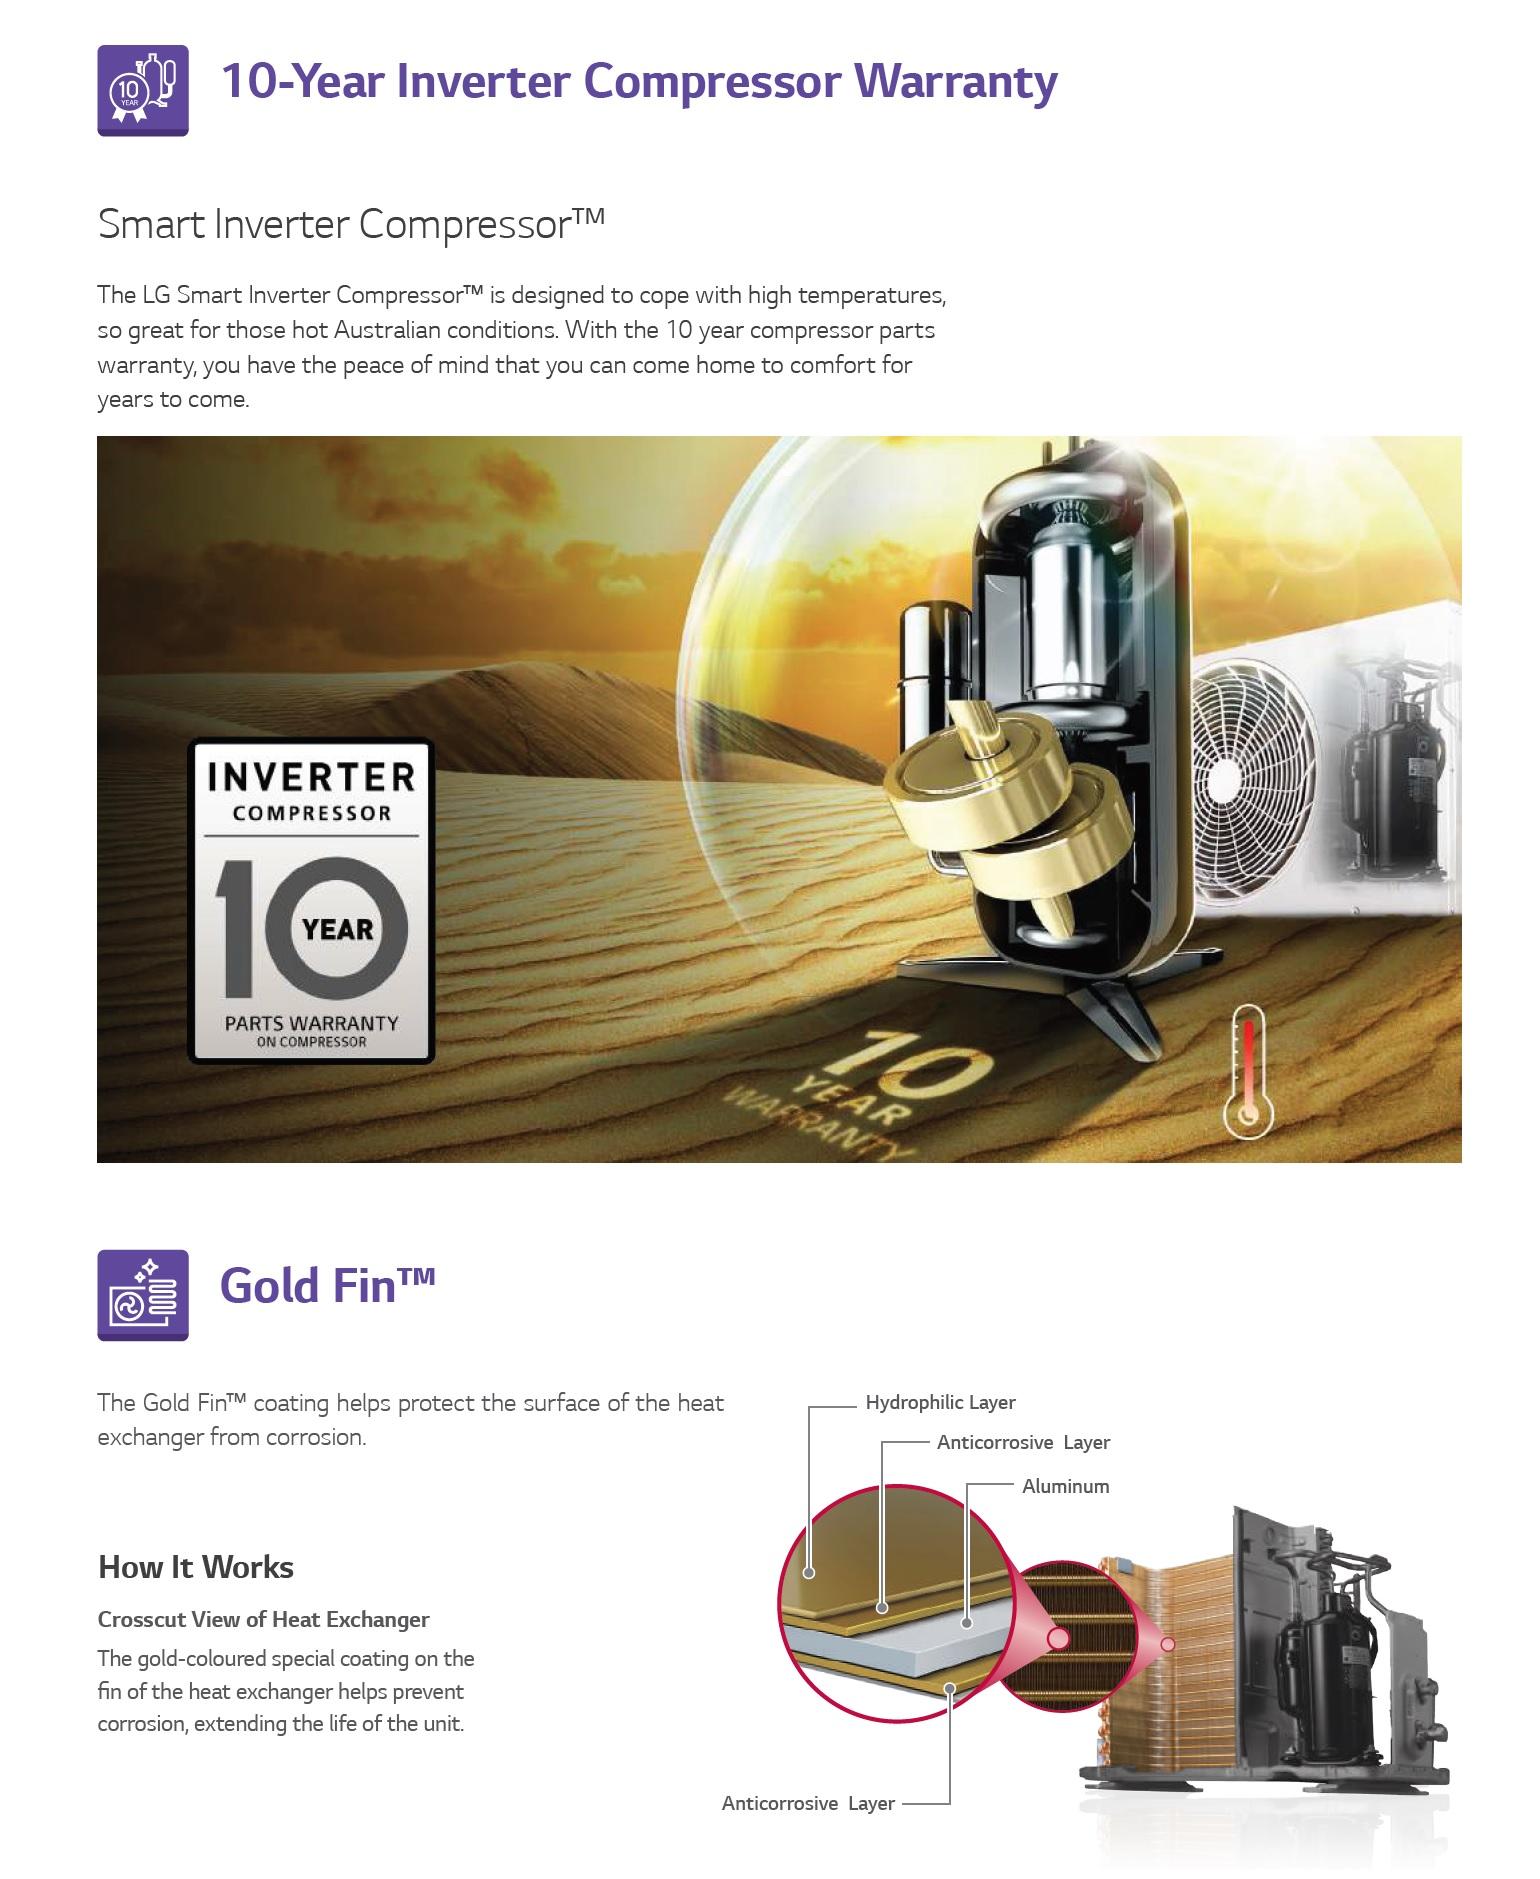 LG air conditioner 10 year warranty